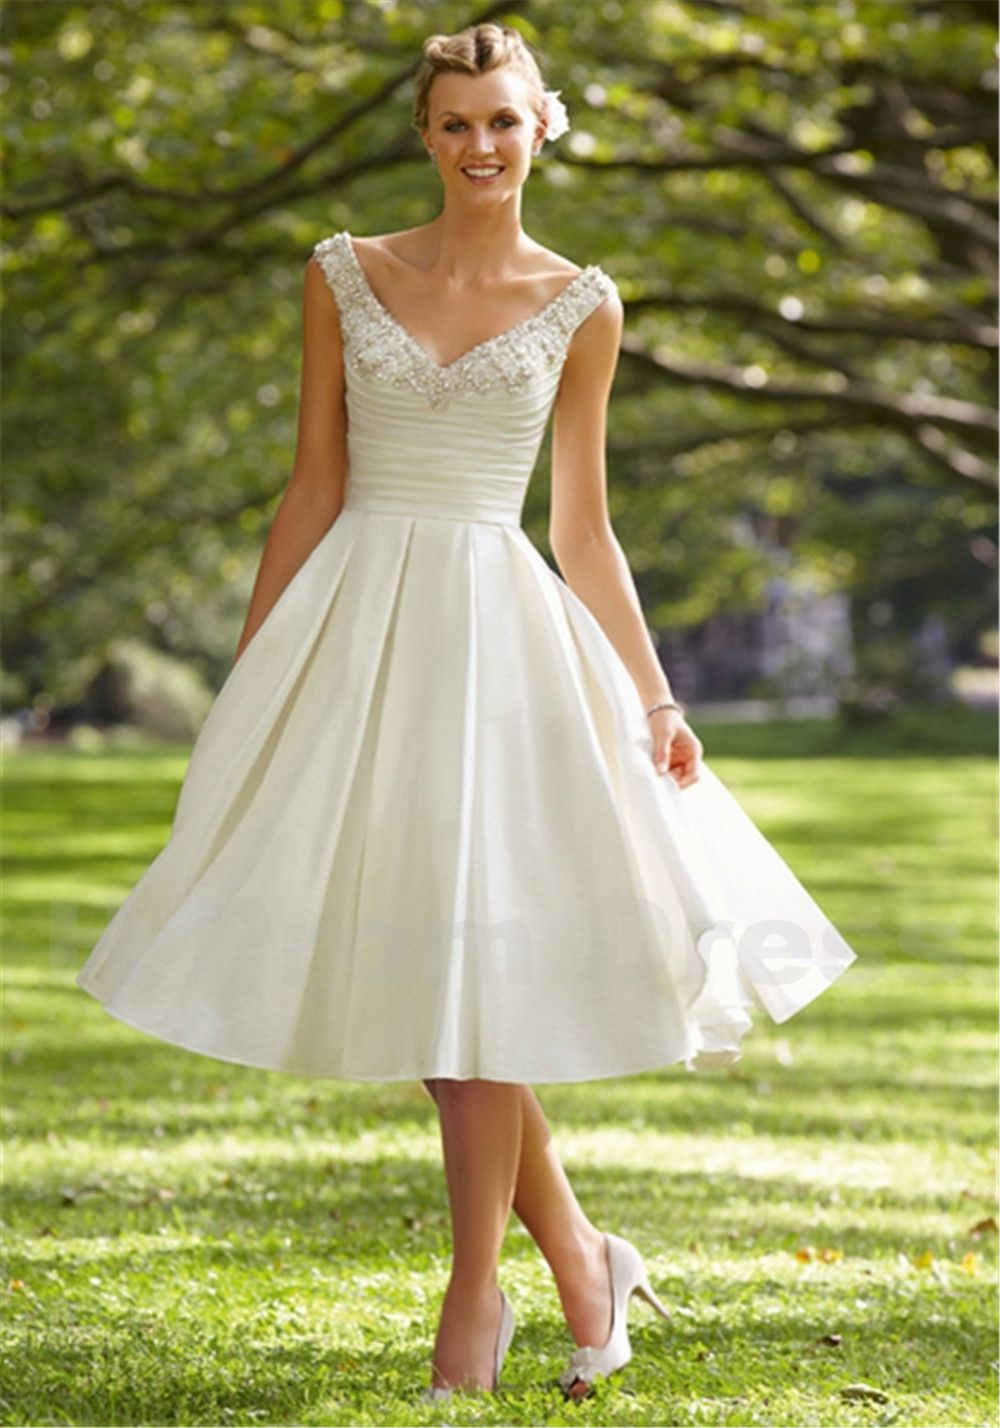 New crystal sequins vestido de noiva backless short wedding dress